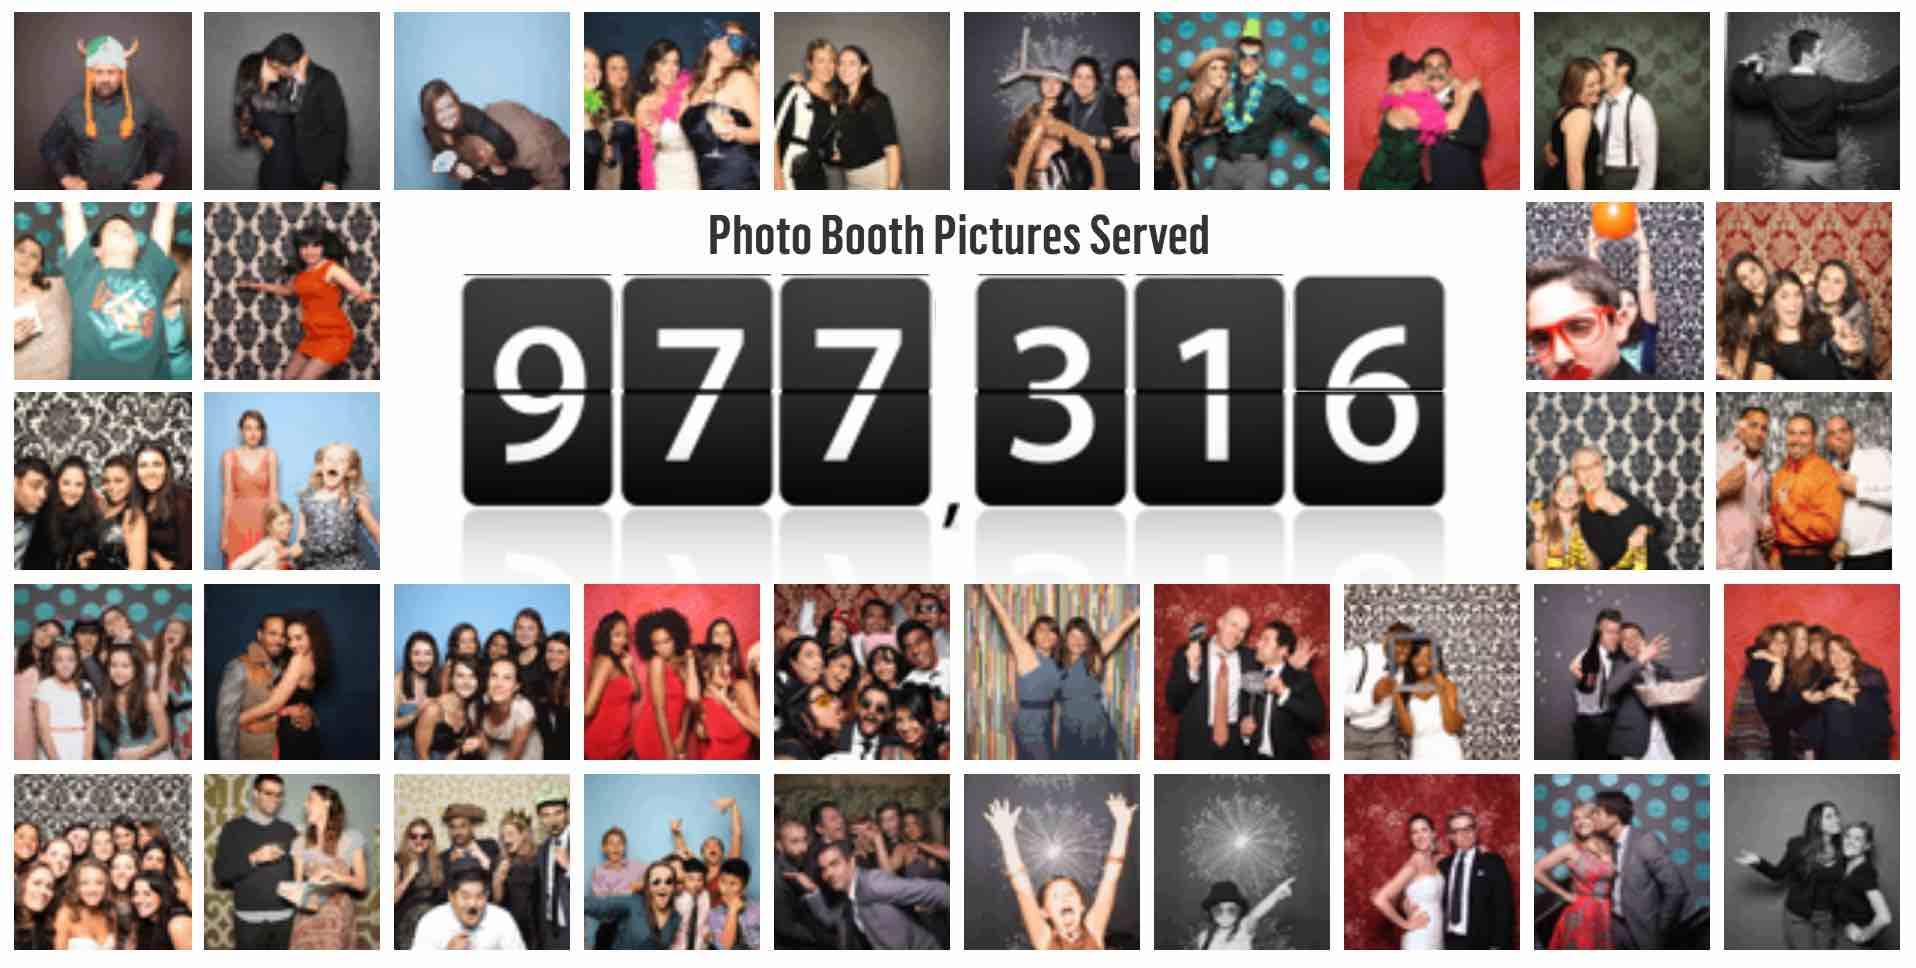 Photo Booth Experience - AspirantSG